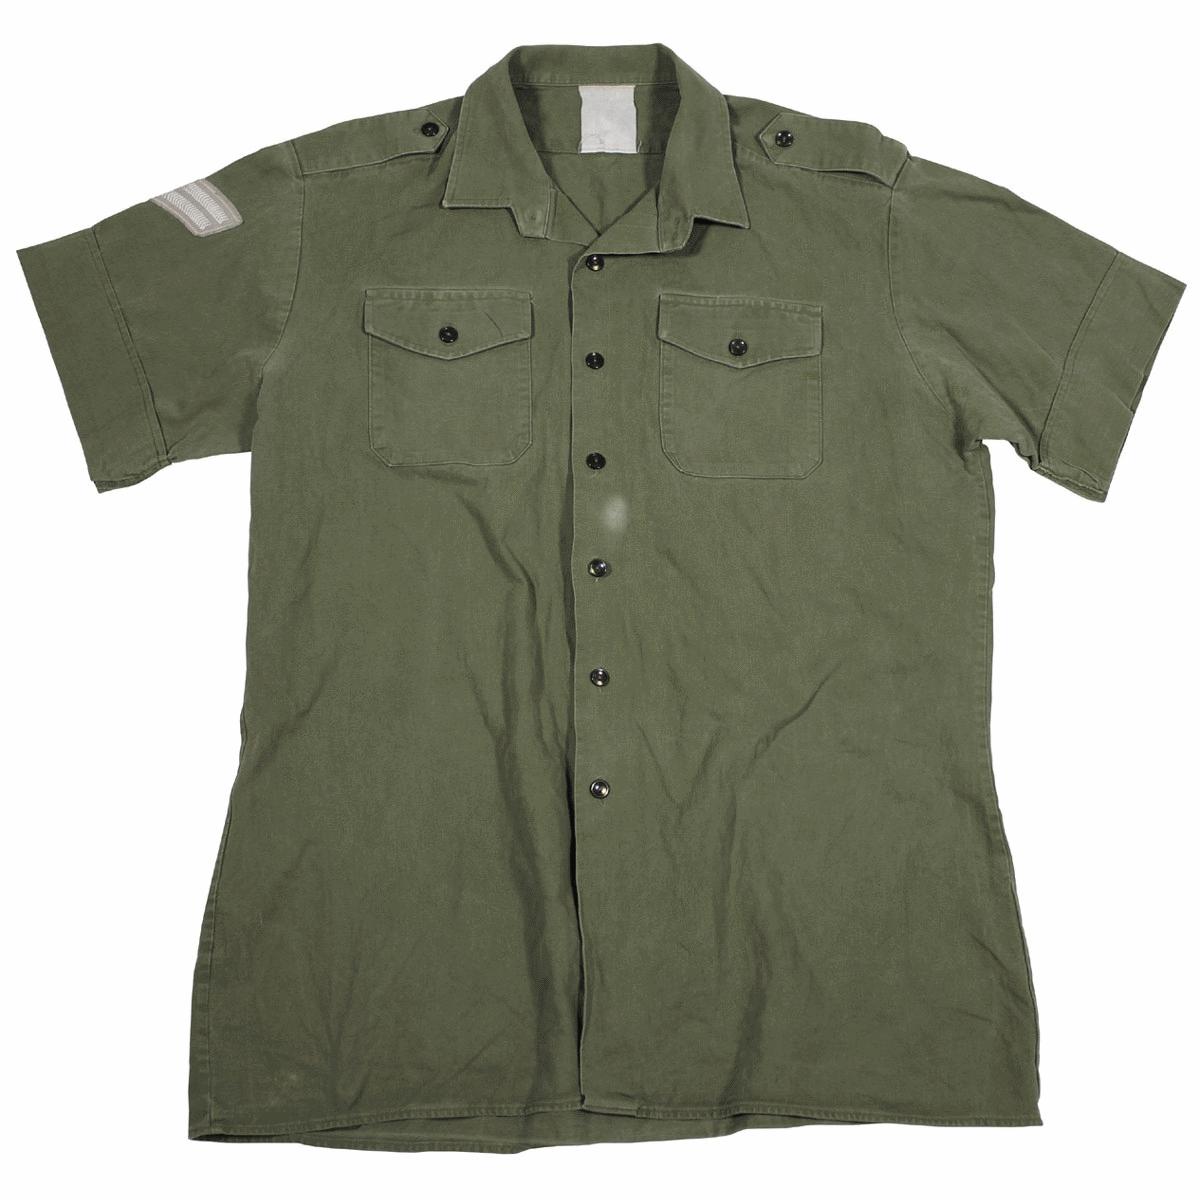 British army surplus vintage olive green short sleev shirt, g1 and g2